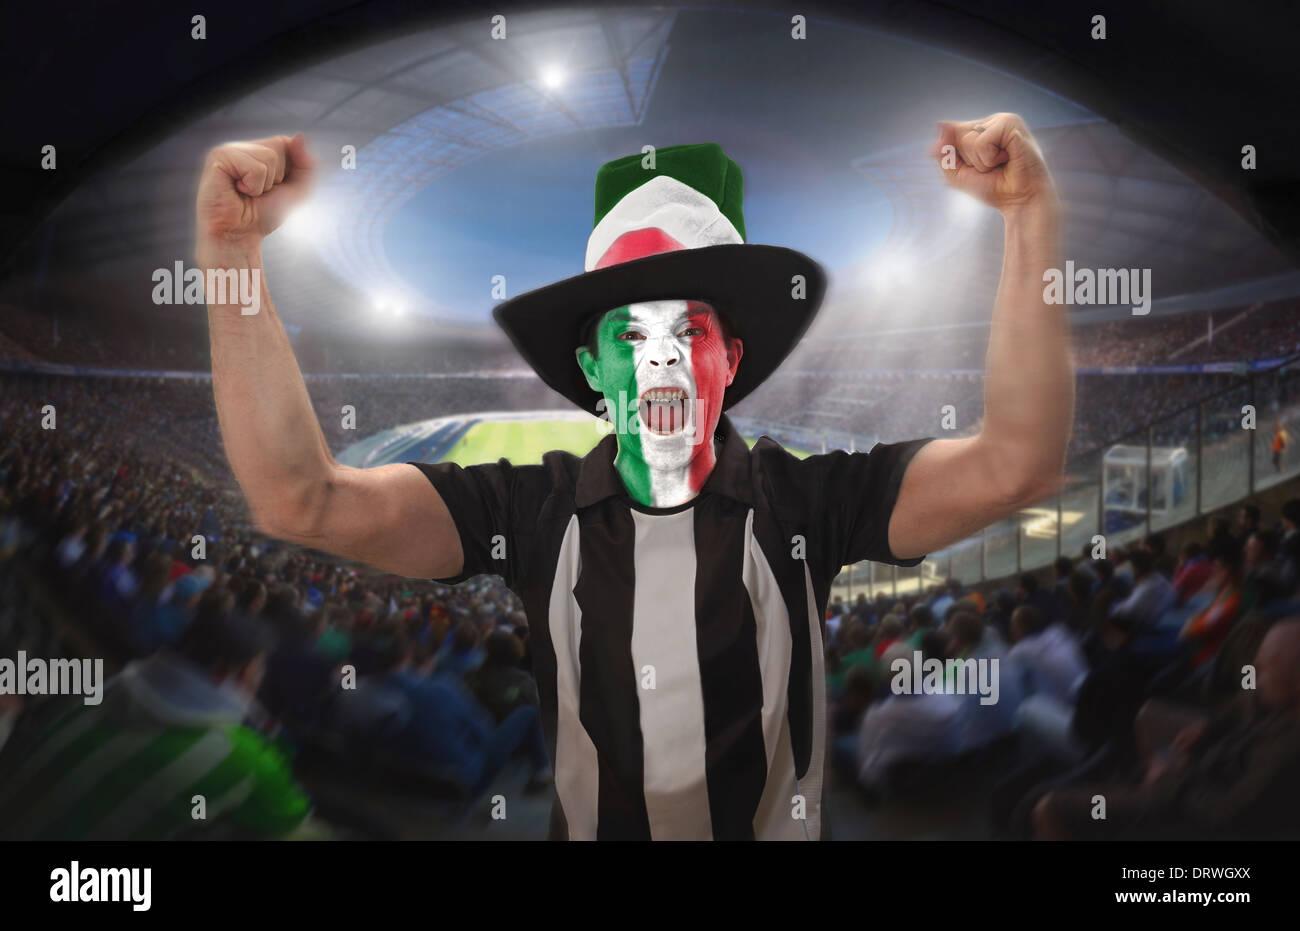 An Italian football fan celebrating a goal in a football stadium. Stock Photo